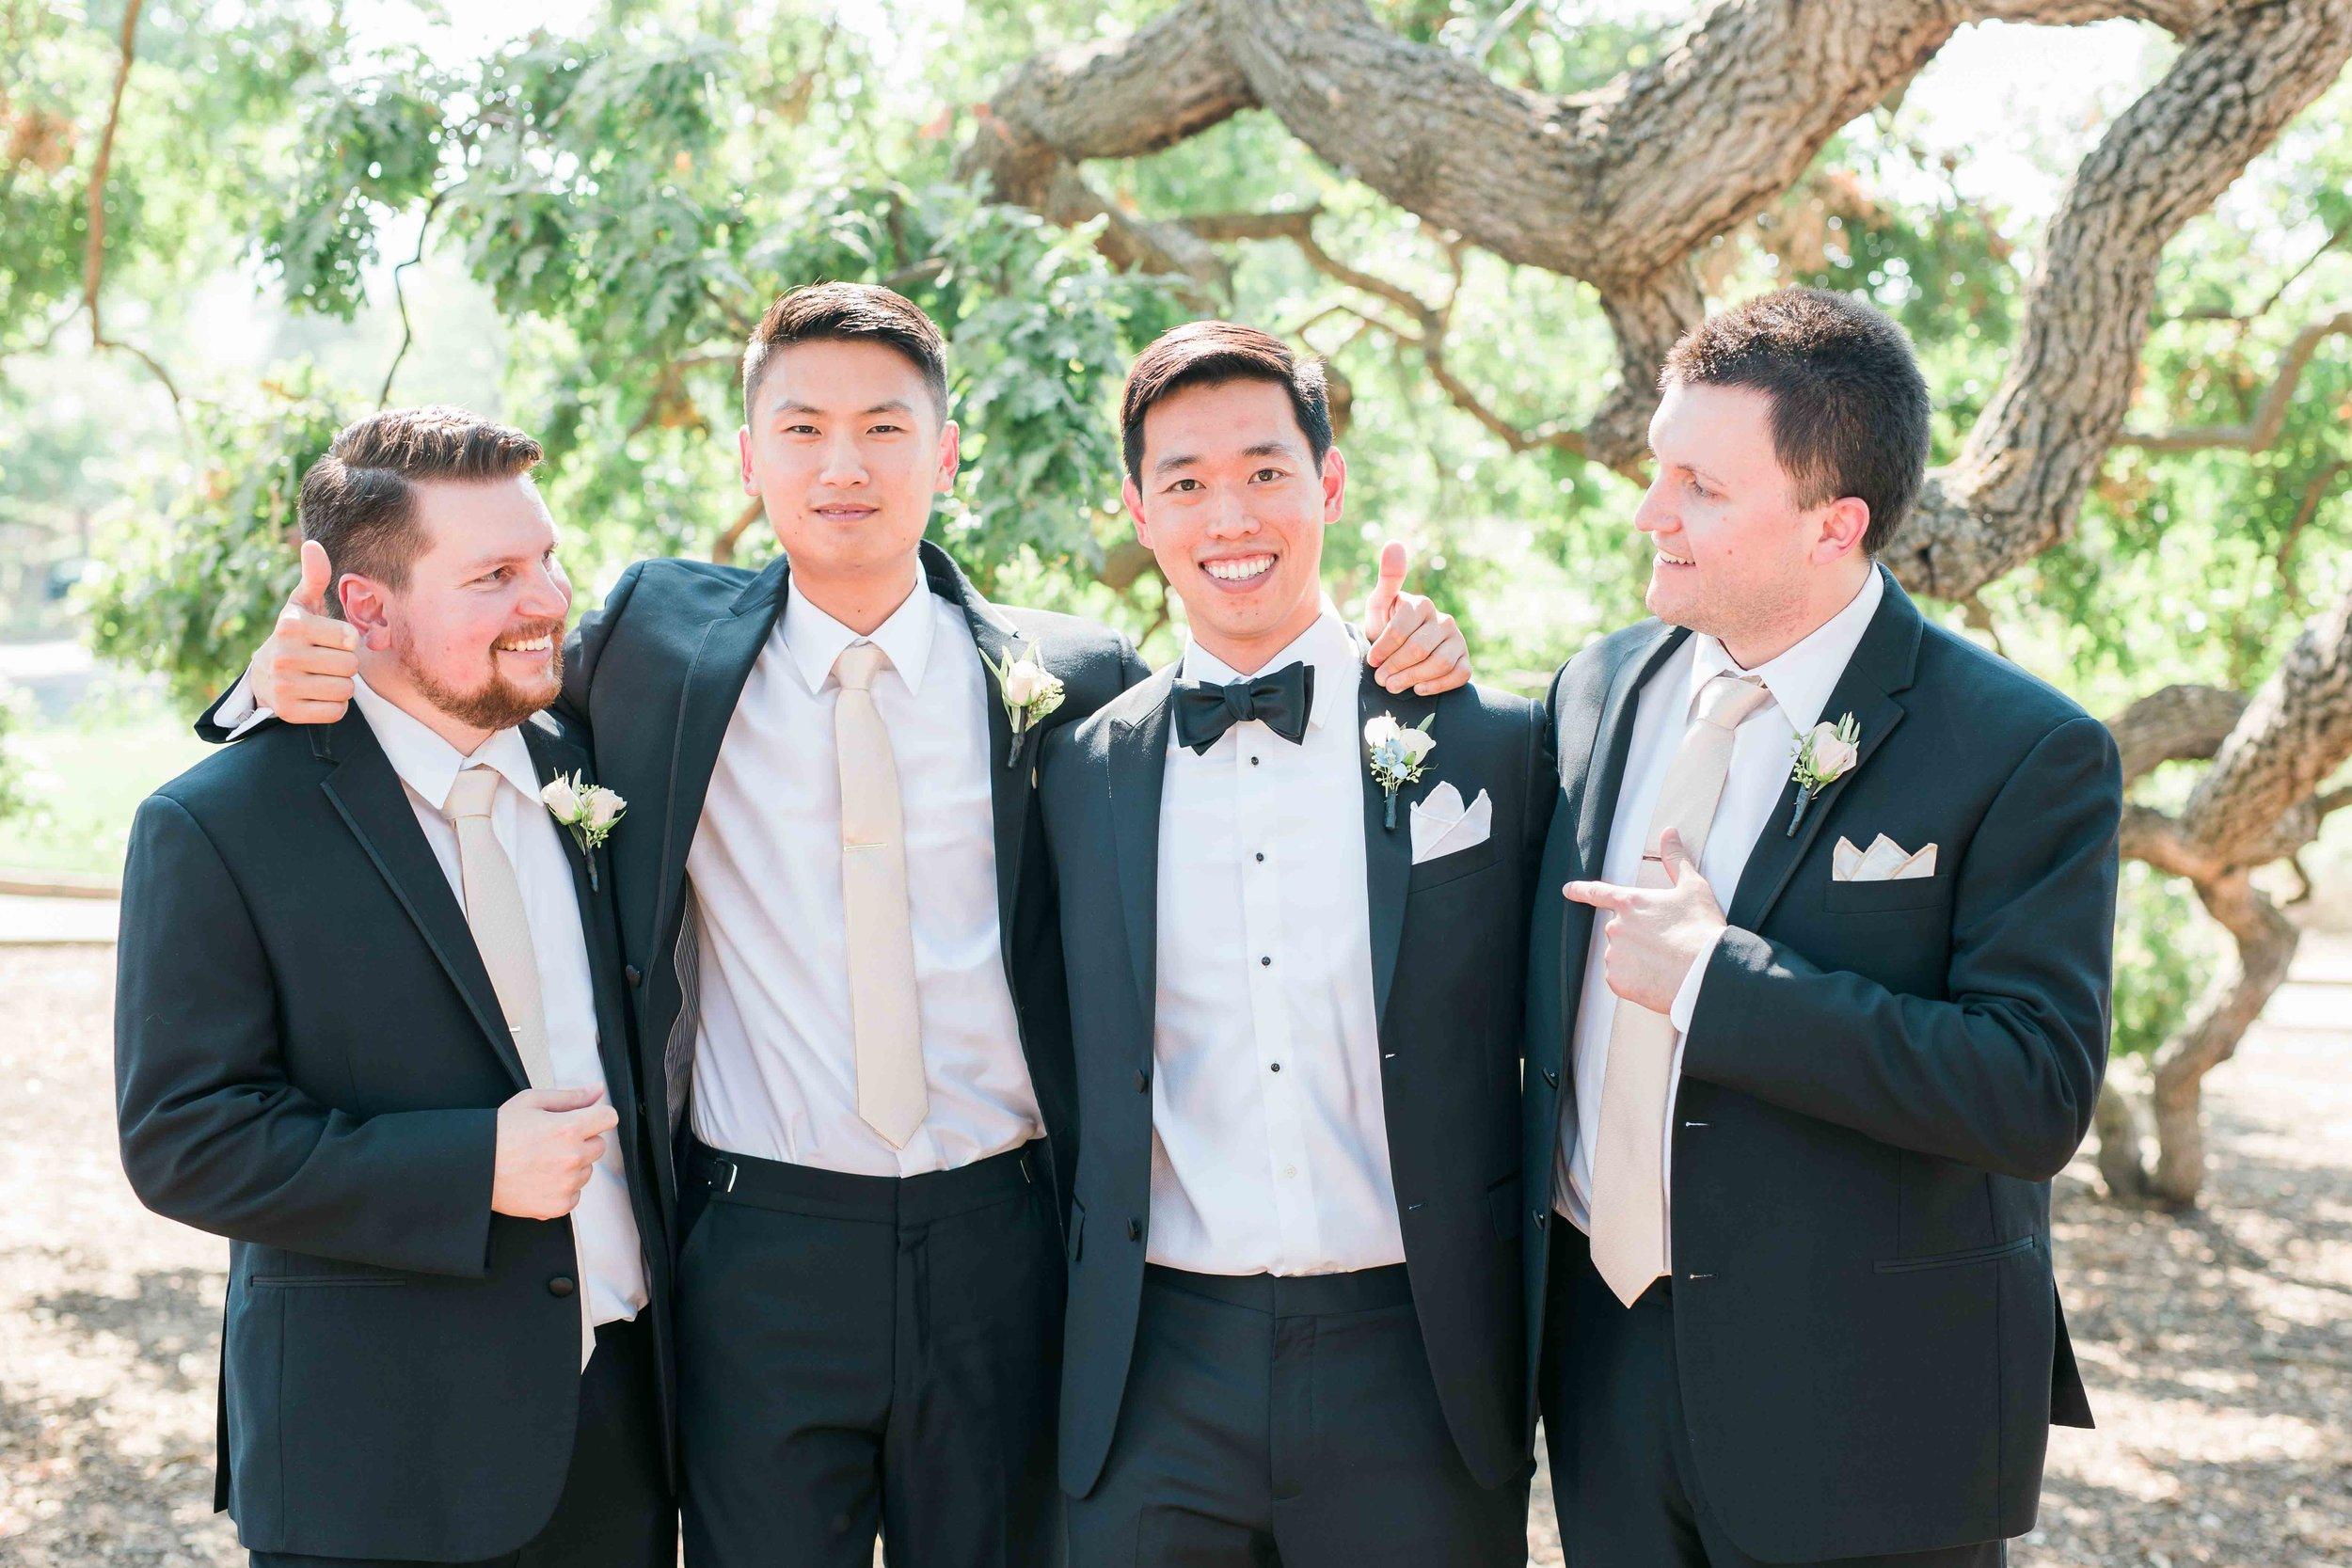 Ruby Hill Wedding Photos by JBJ Pictures - San Francisco Wedding Photographer - Pleasanton Wedding Venue (26).jpg